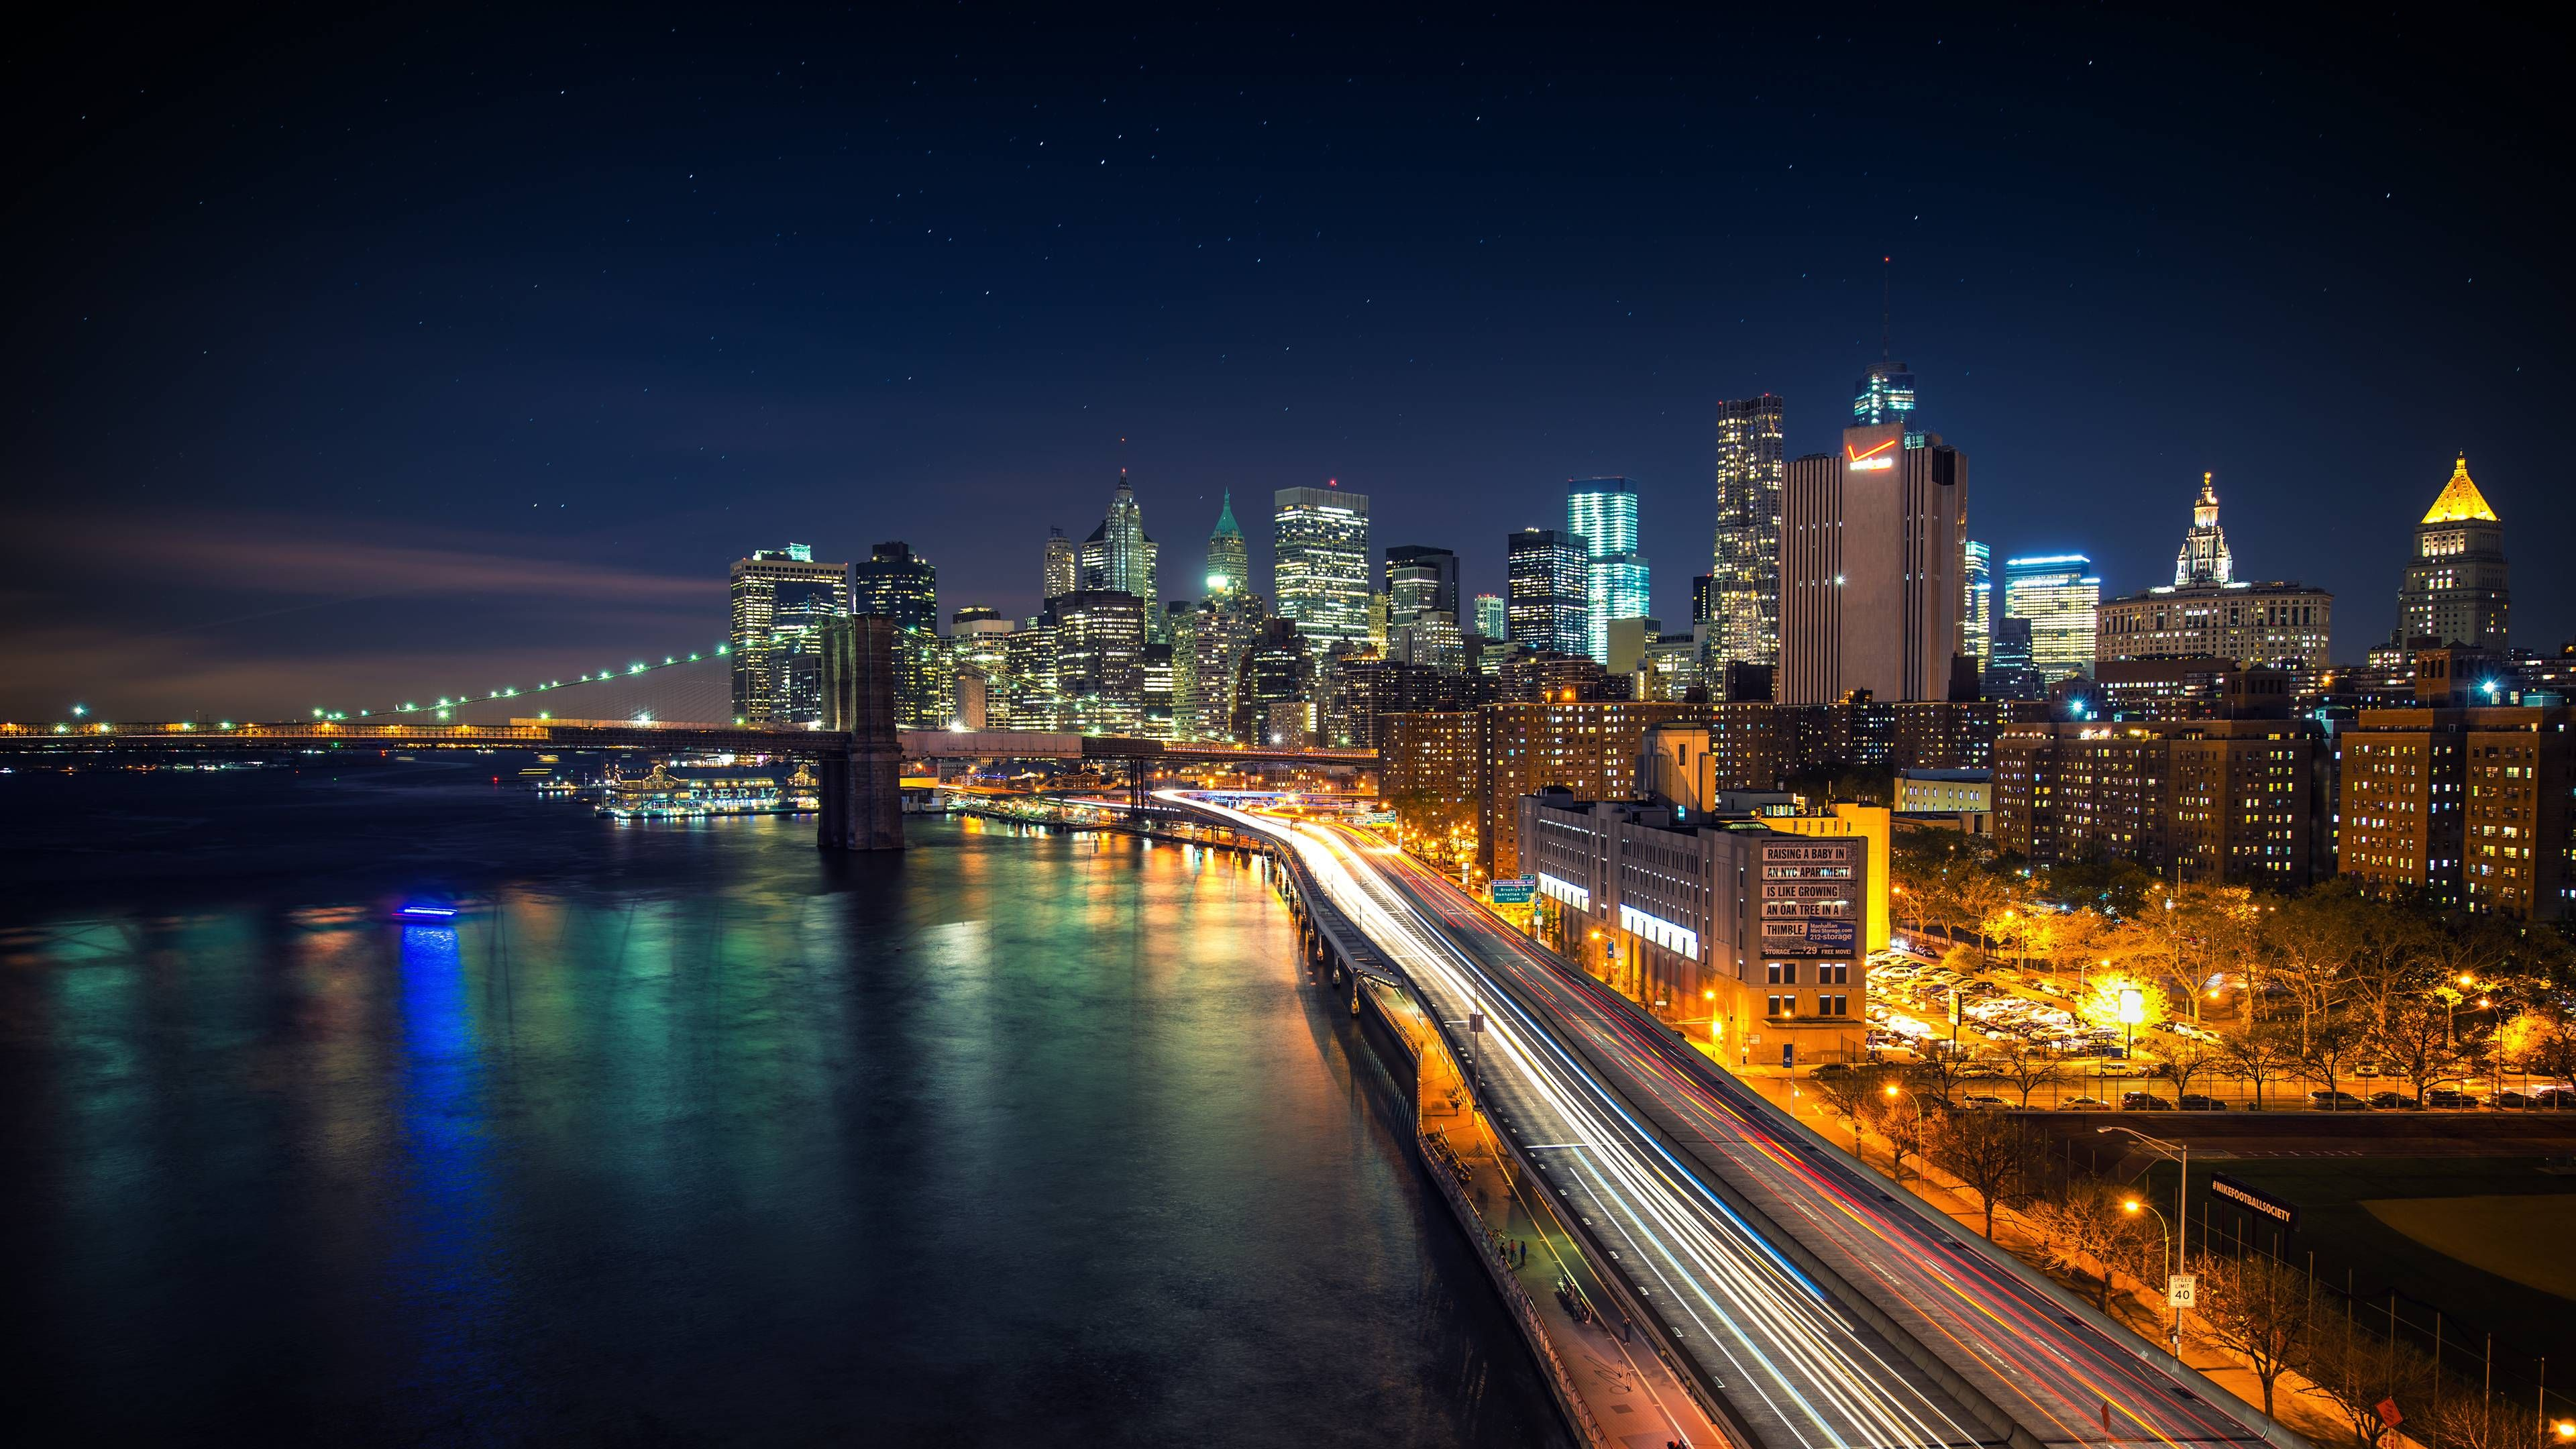 Ipad Pro Wallpapers 2732 X 2048 Macrumors Forums City Wallpaper New York Wallpaper Night City